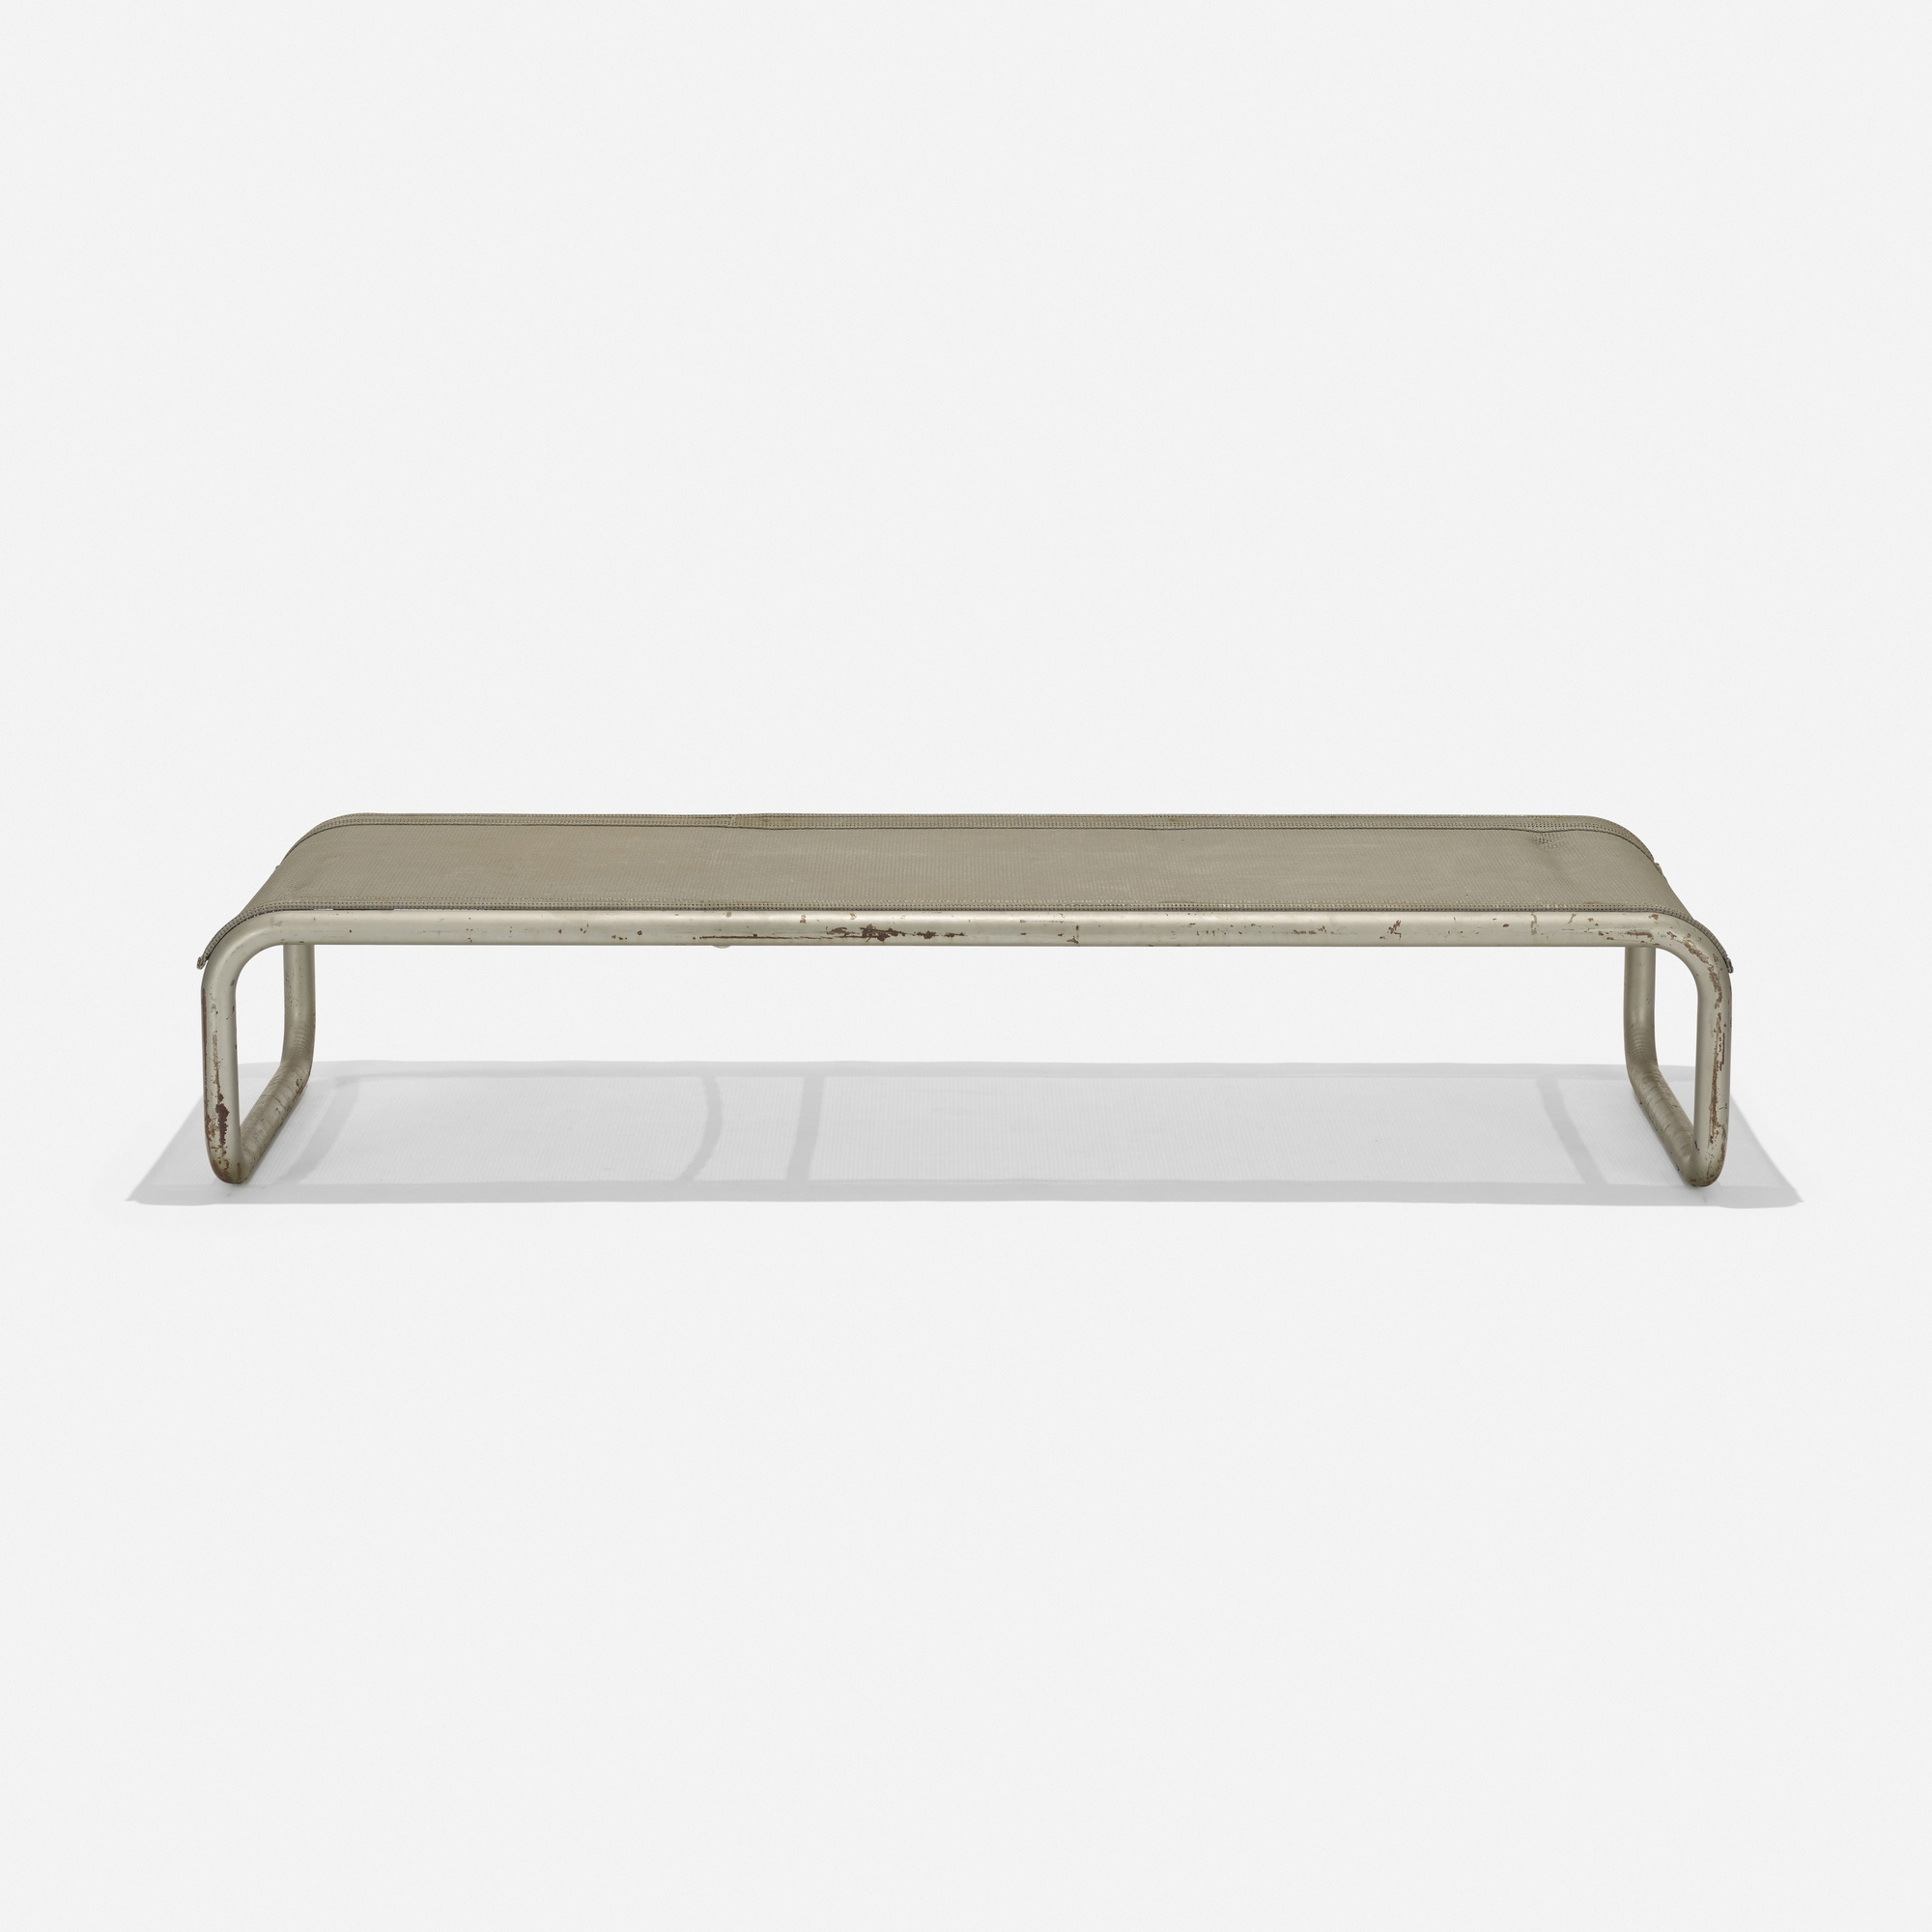 013c33d6a104 ... 135  Richard Schultz   Prototype adjustable chaise lounge (2 of 3)